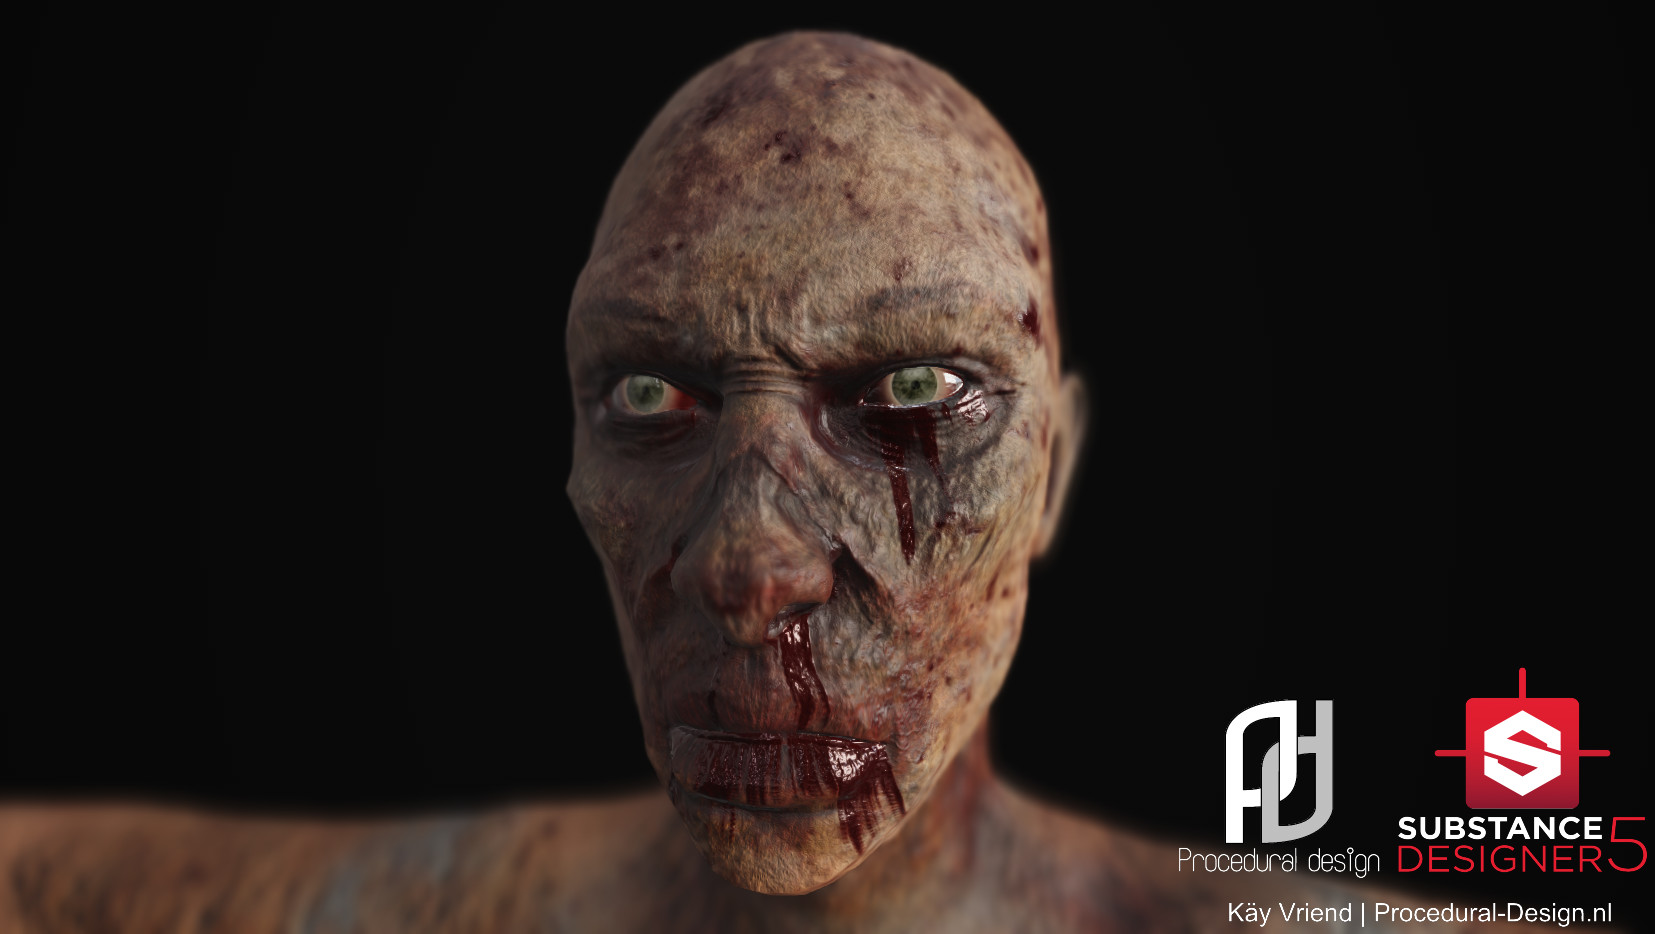 Kay vriend zombie 11